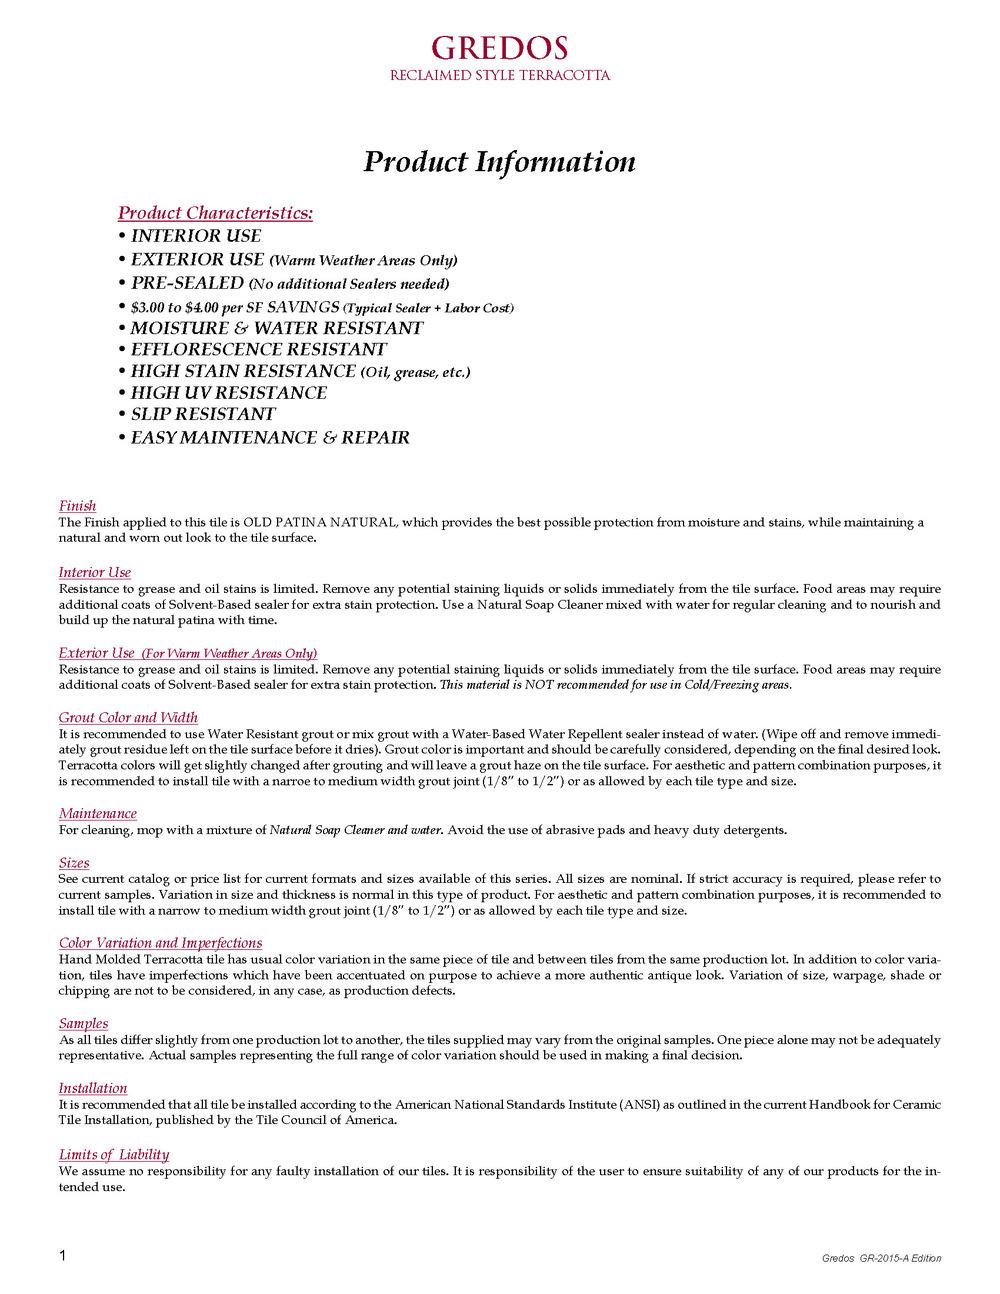 3-Gredos-ProductInfo-2015-A.jpg